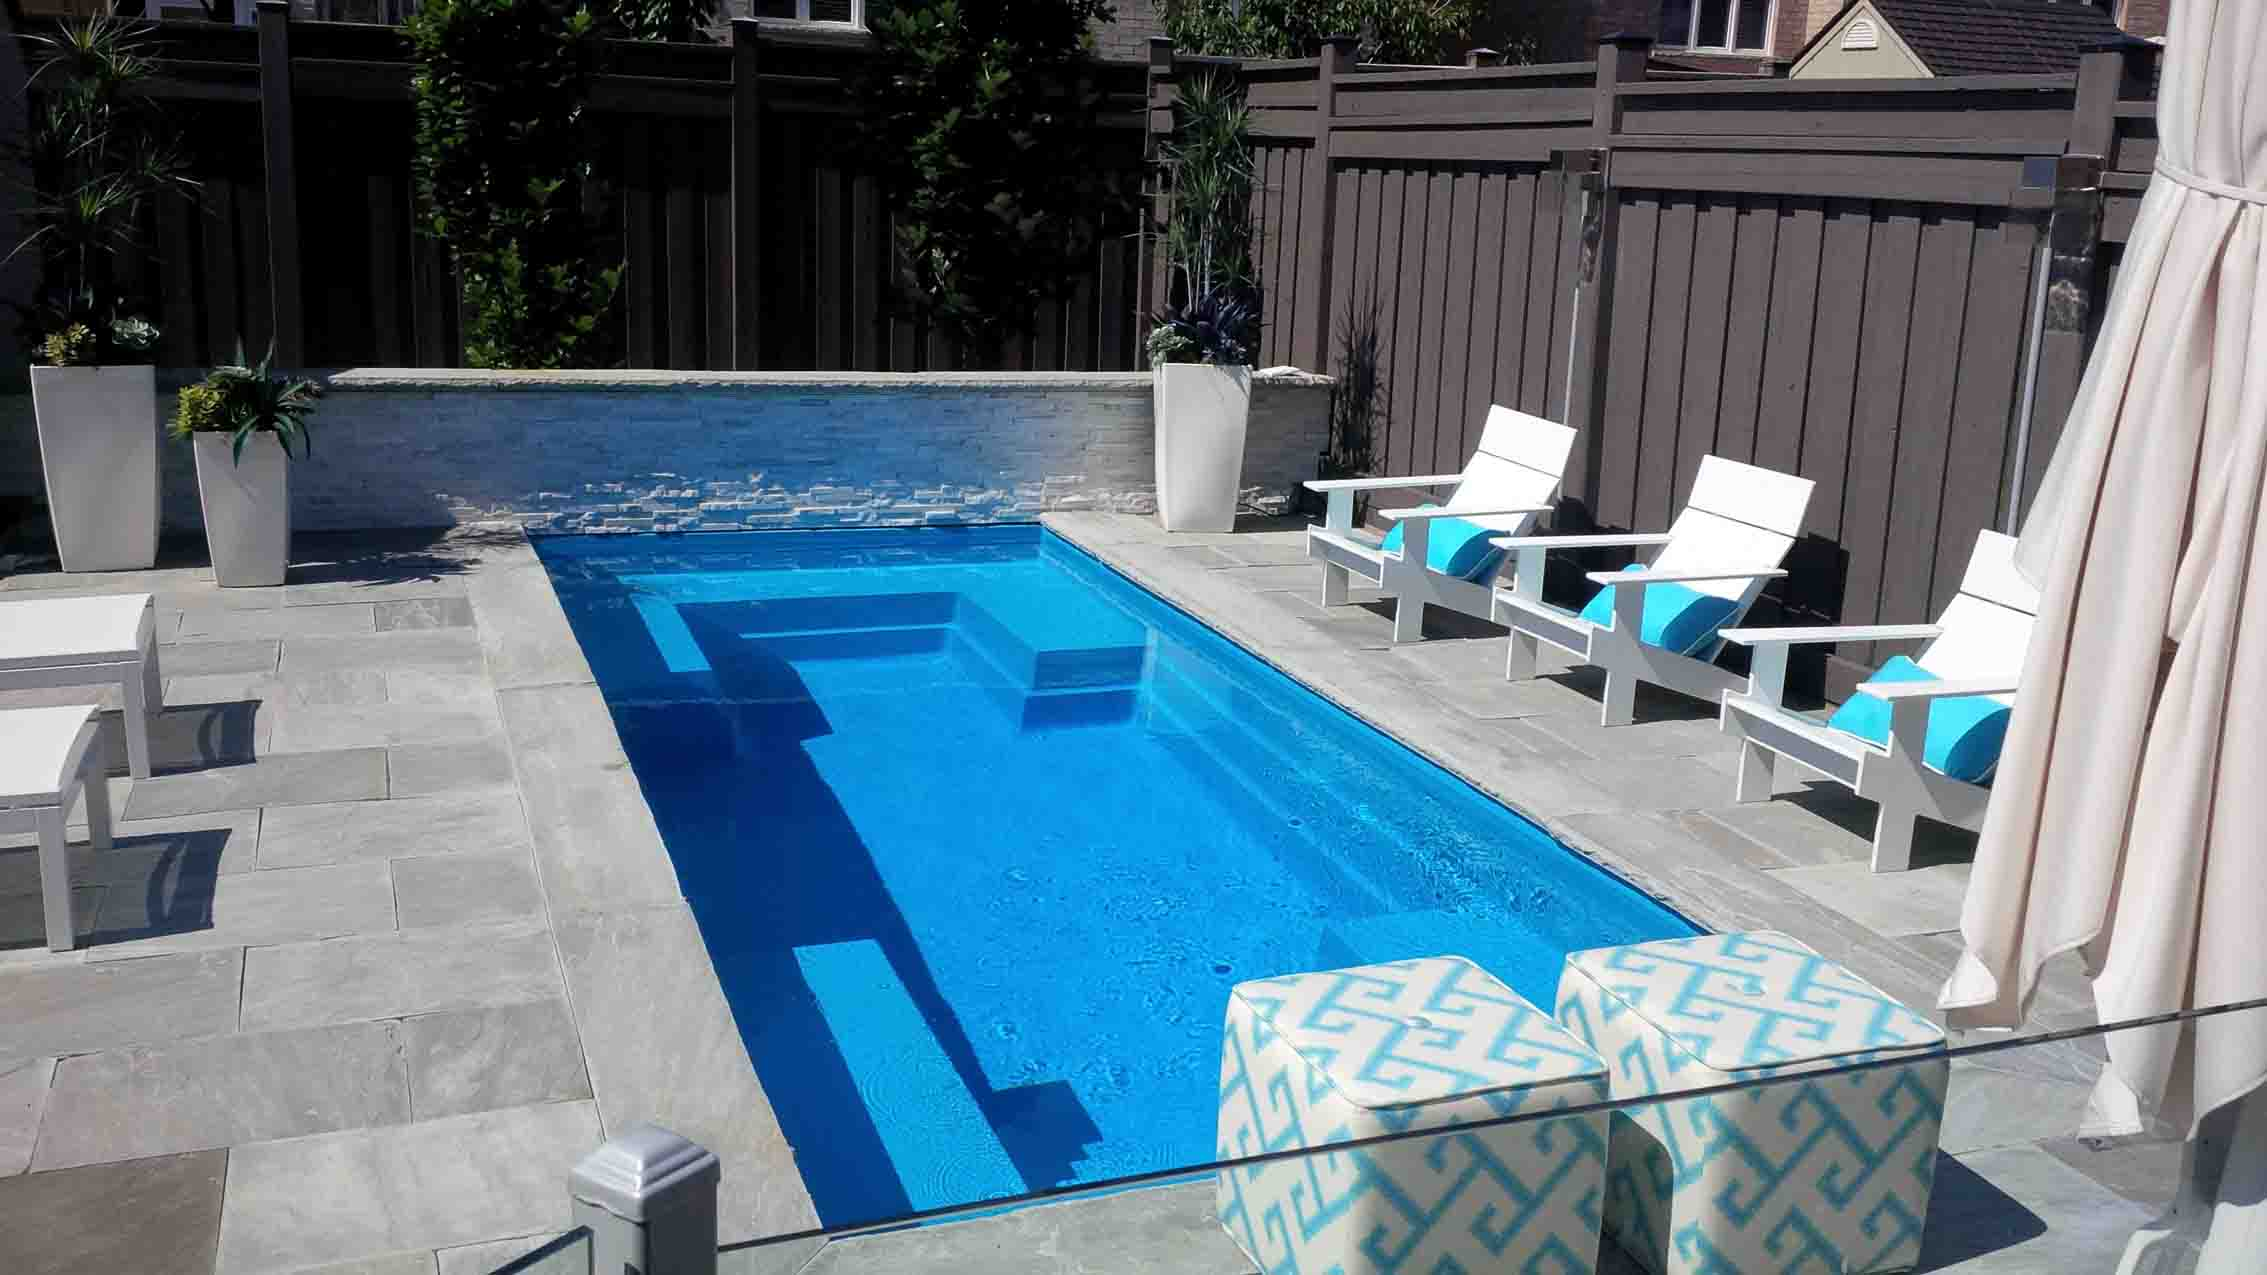 Fiberglass Inground Swimming Pools And Spas